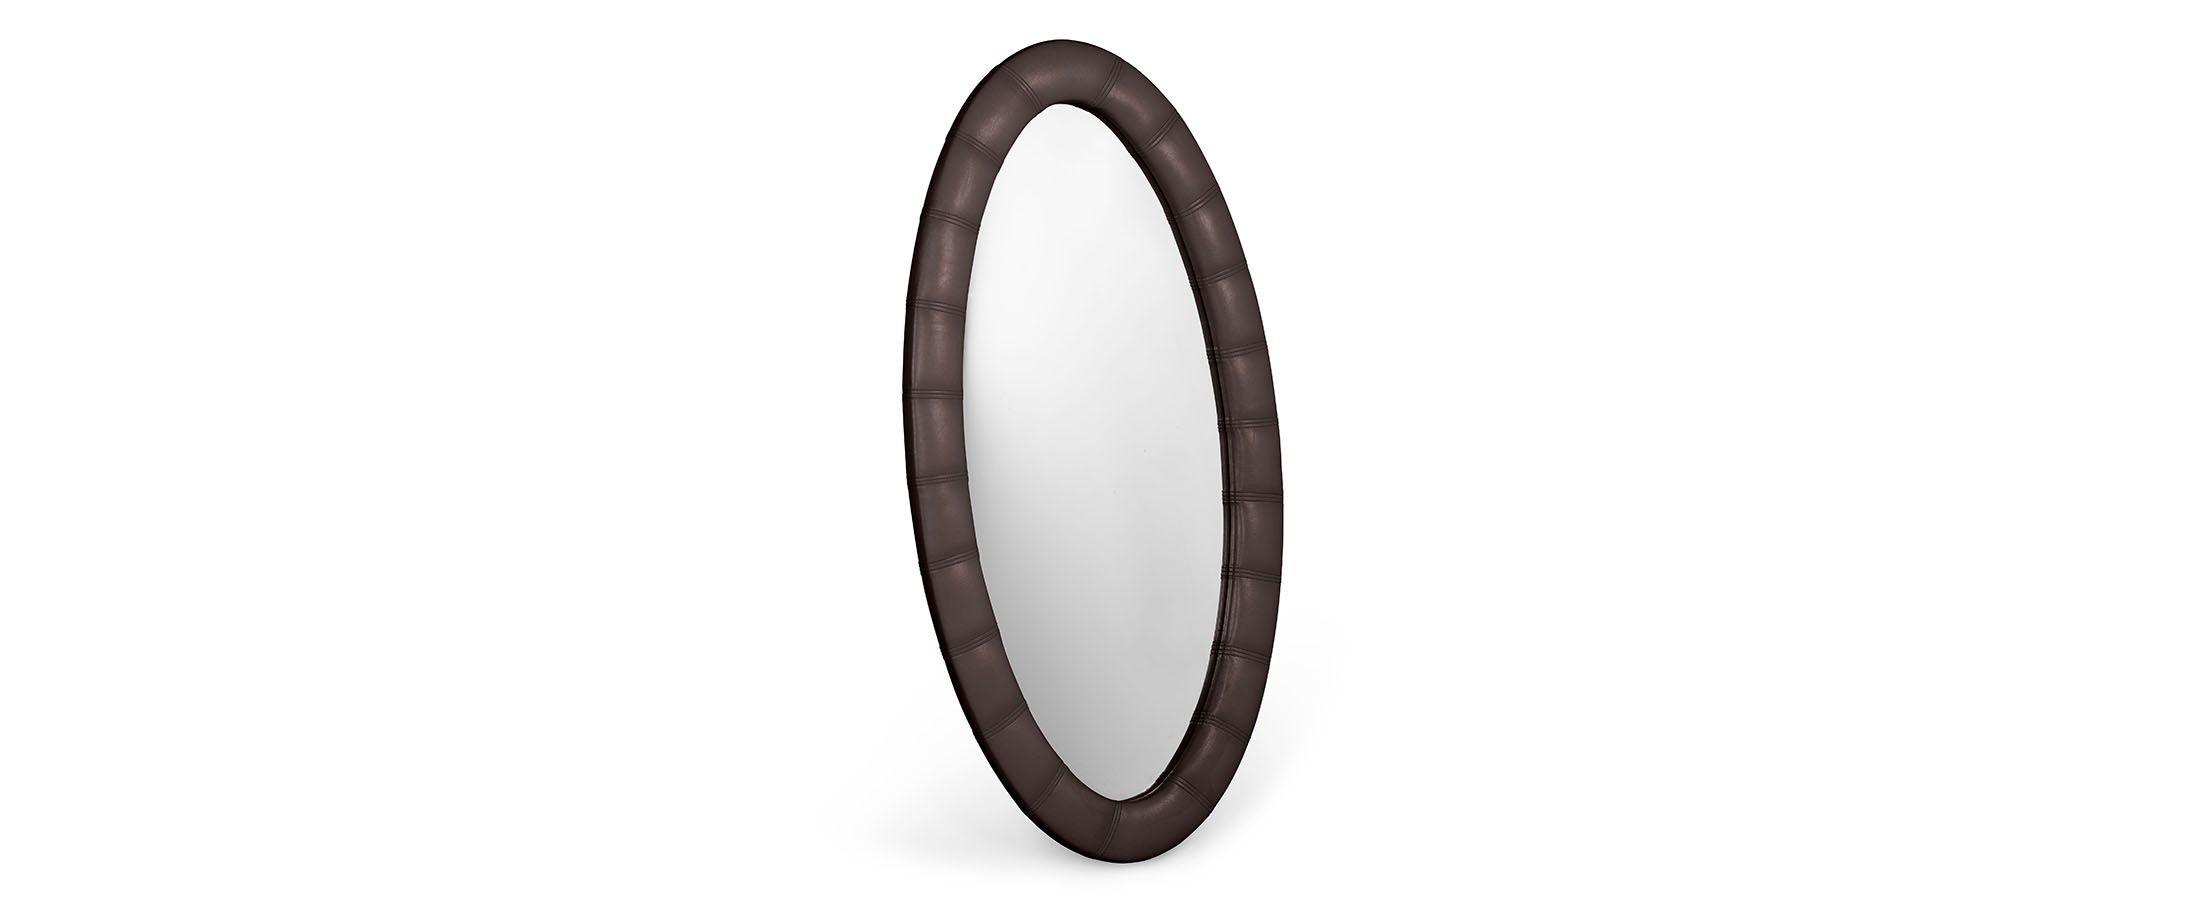 Зеркало Люнетта кофеЗеркало навесное в спальню. Обивка из экокожи. Артикул: К000453<br>